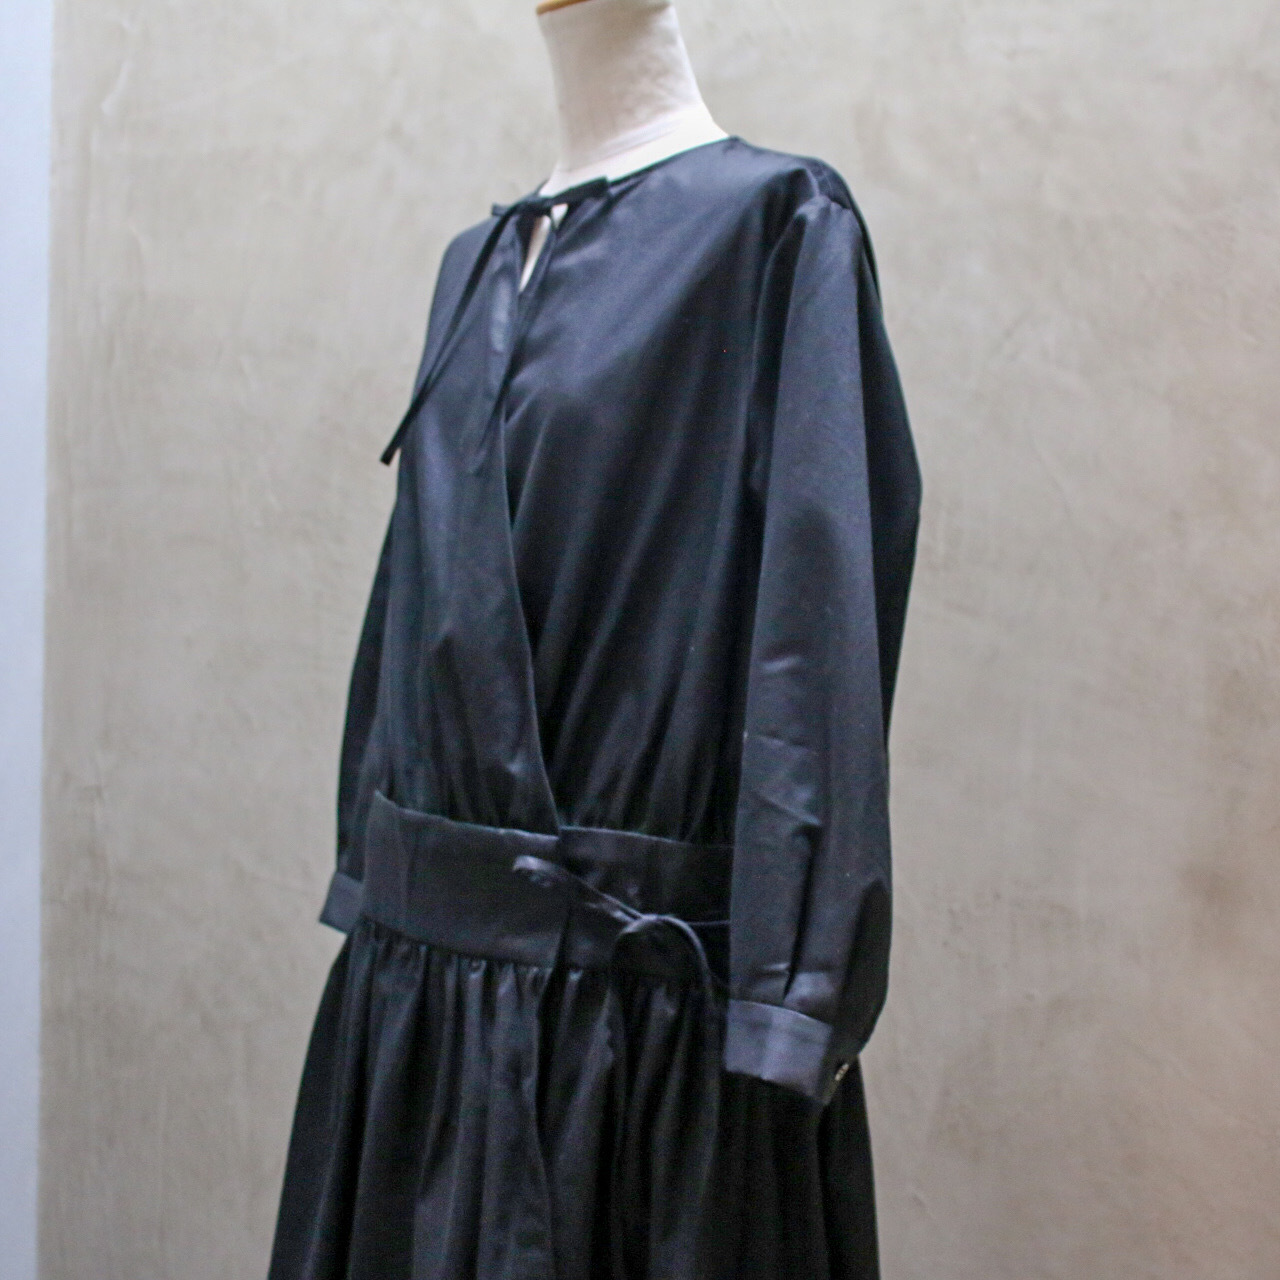 TENNE HANDCRAFTED MODERN Cash our Dress #015  black カシュクールドレス